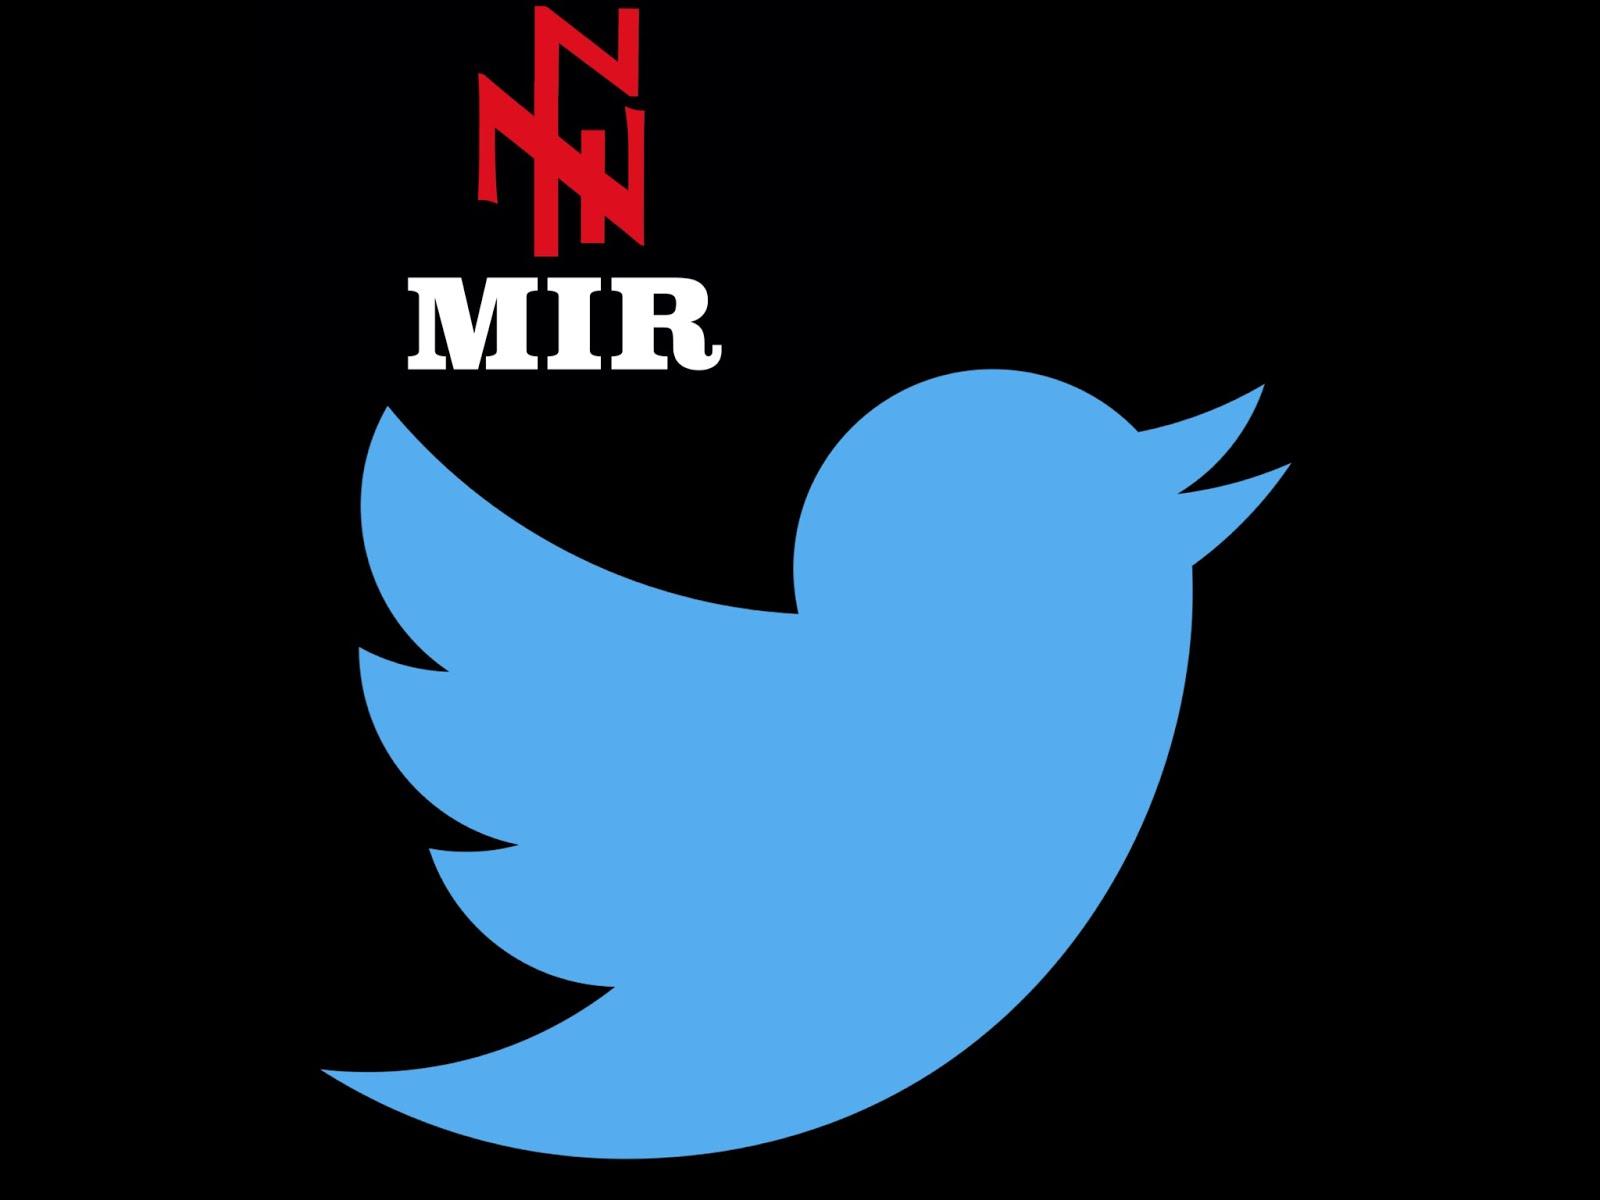 Follow The Daily RedBeard on Twitter